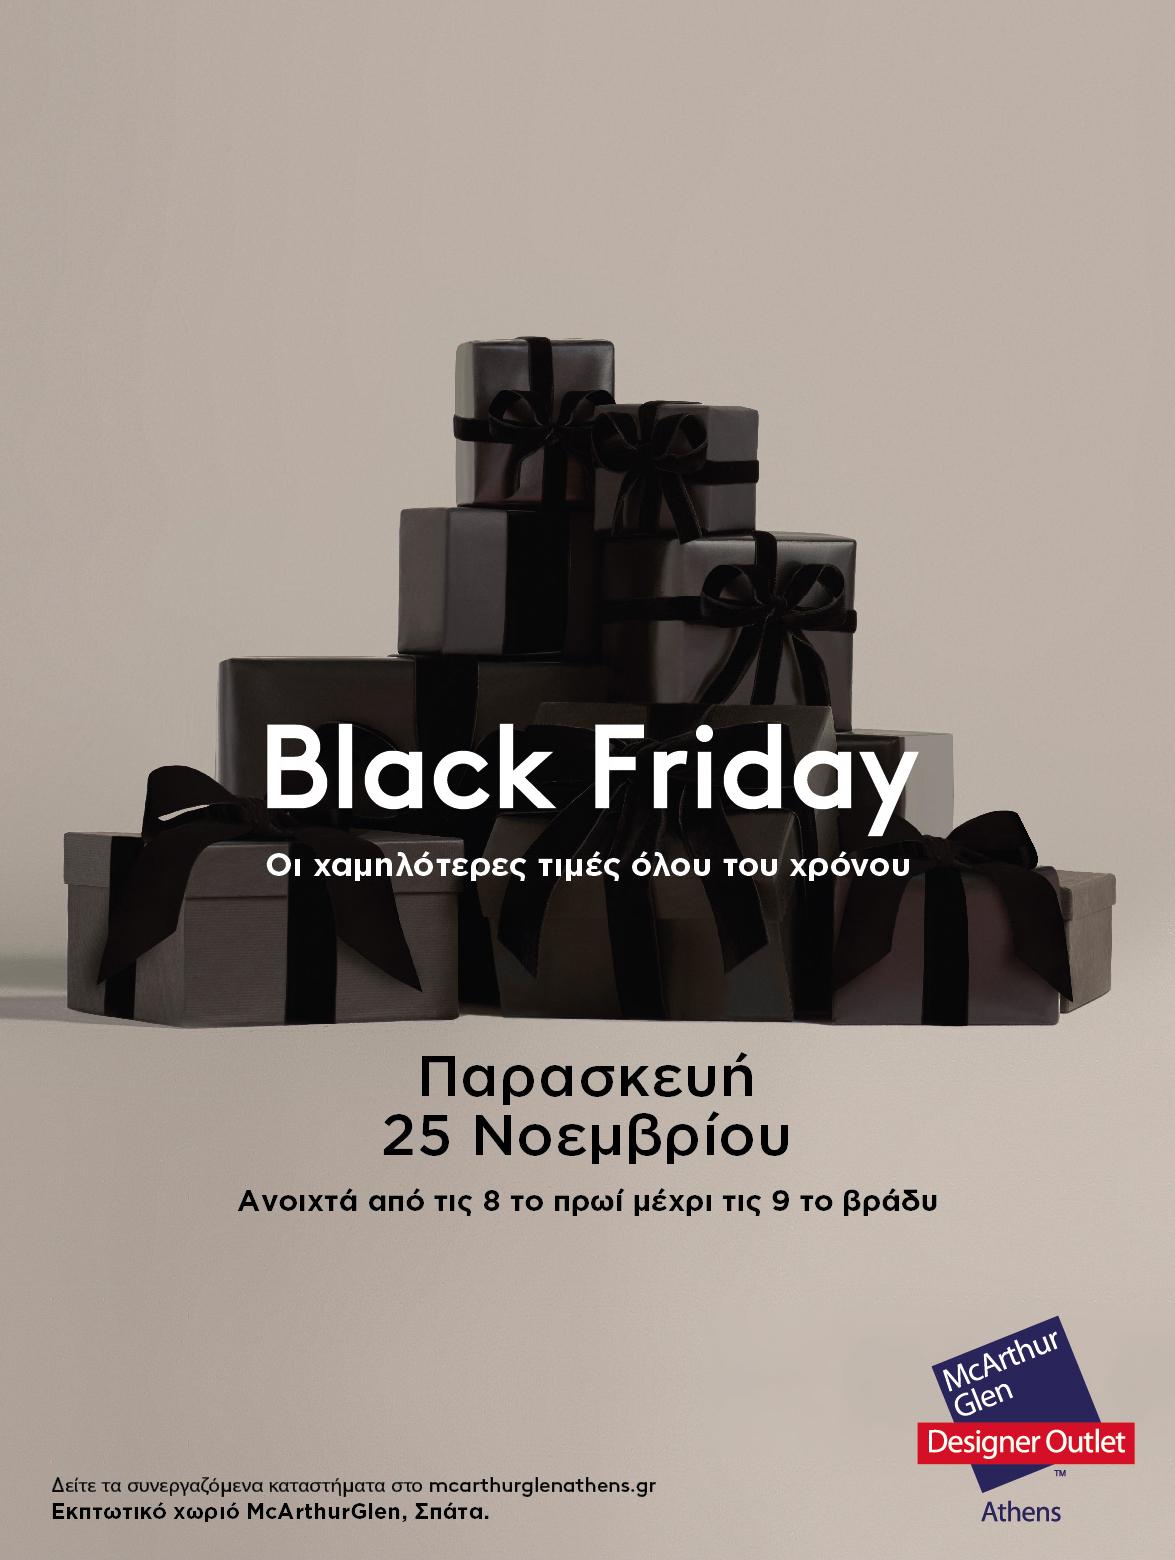 ktx Black Friday 20x265 01 2